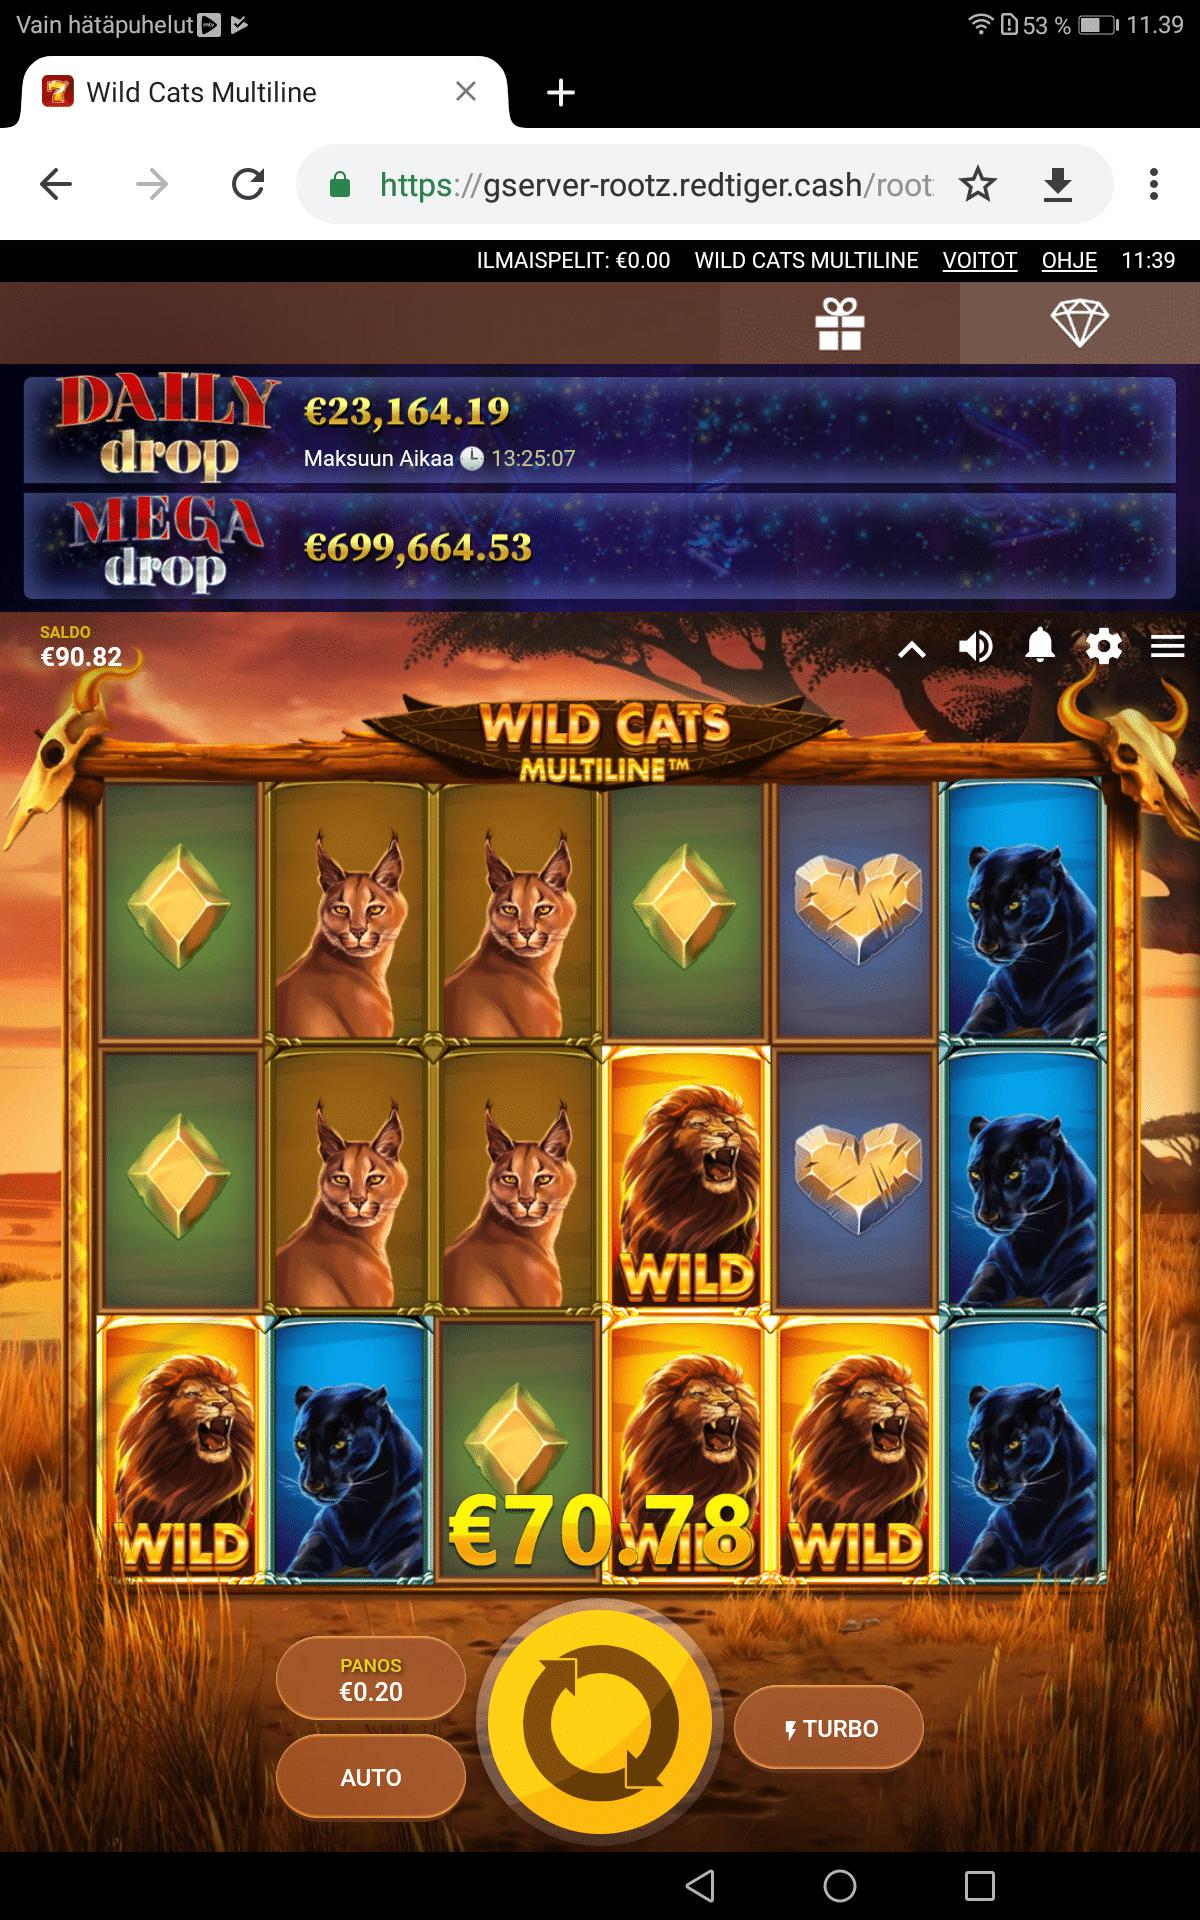 Wild cats Multiline big win picture